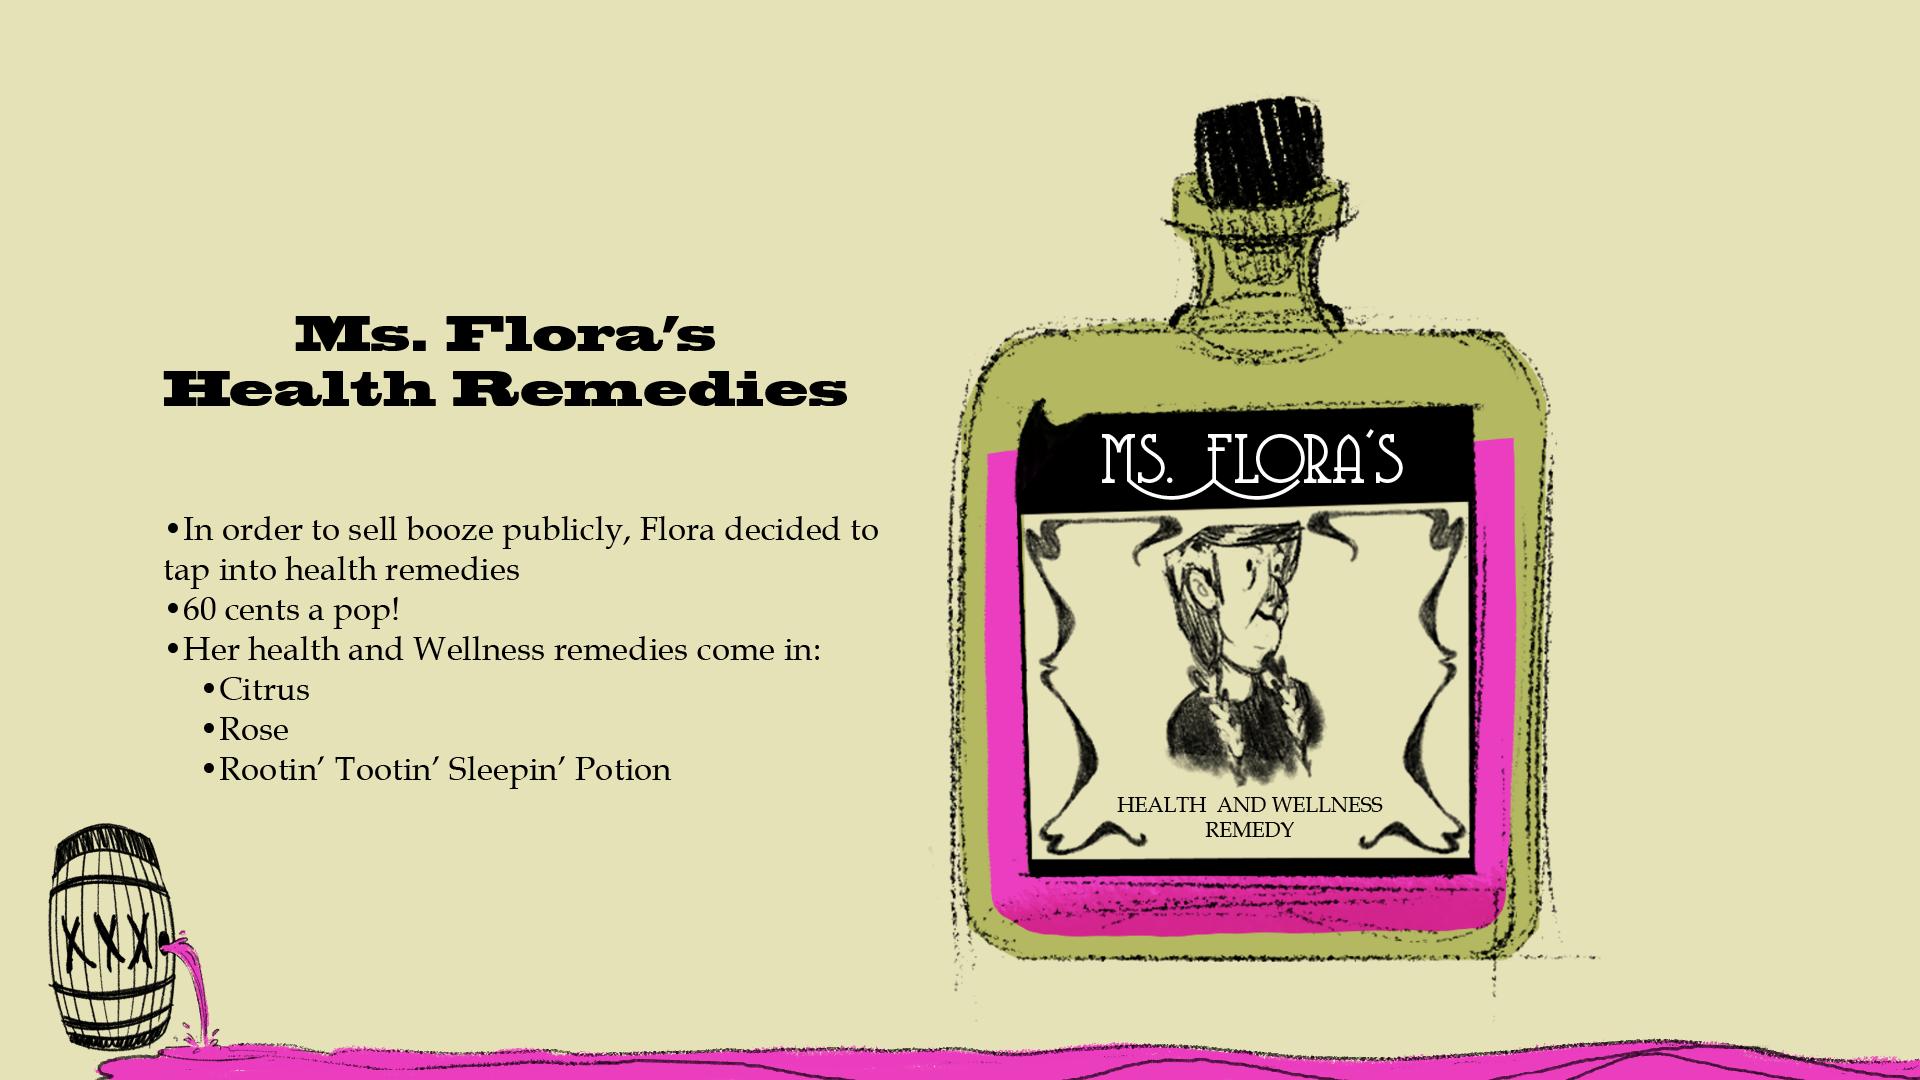 Ms. Flora's Health Remedies